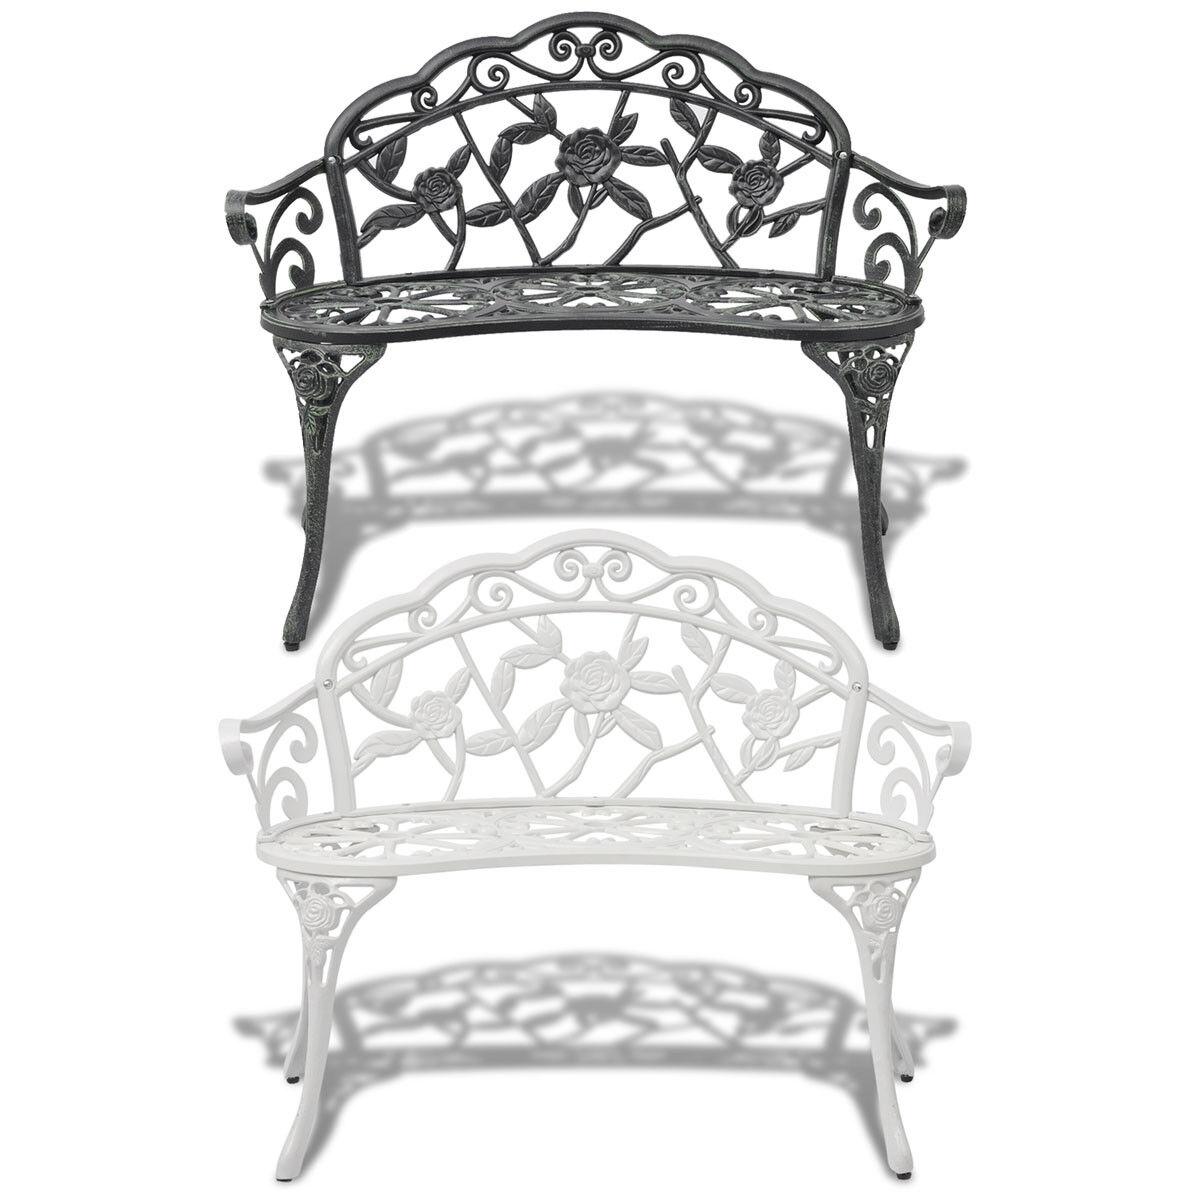 New Garden Bench Chair Porch Park Aluminum Outdoor Antique S